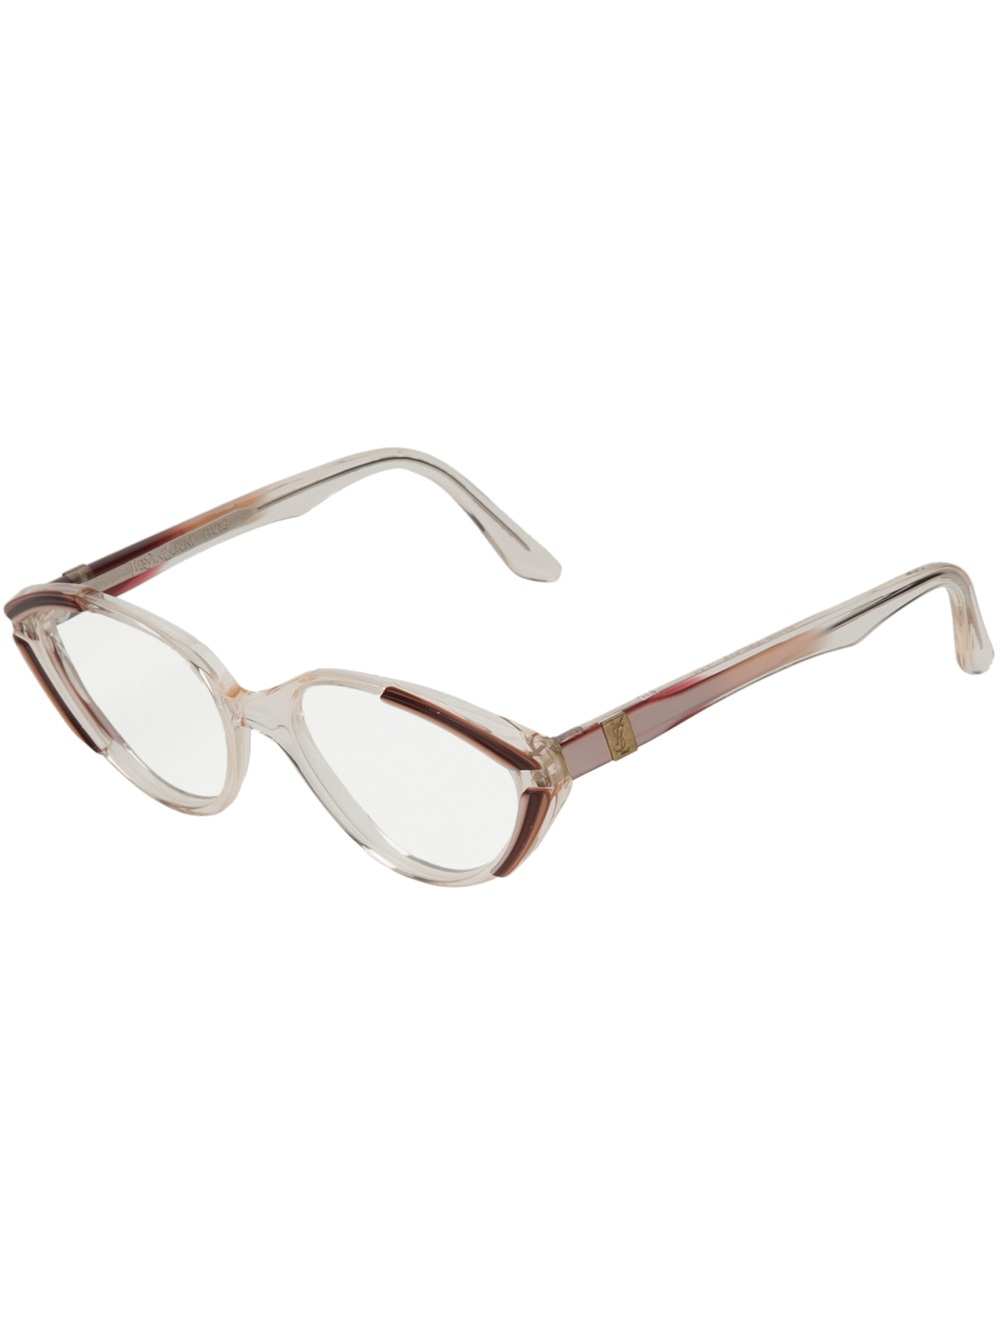 Yves Saint Laurent Vintage Oval Frame Glasses in ...